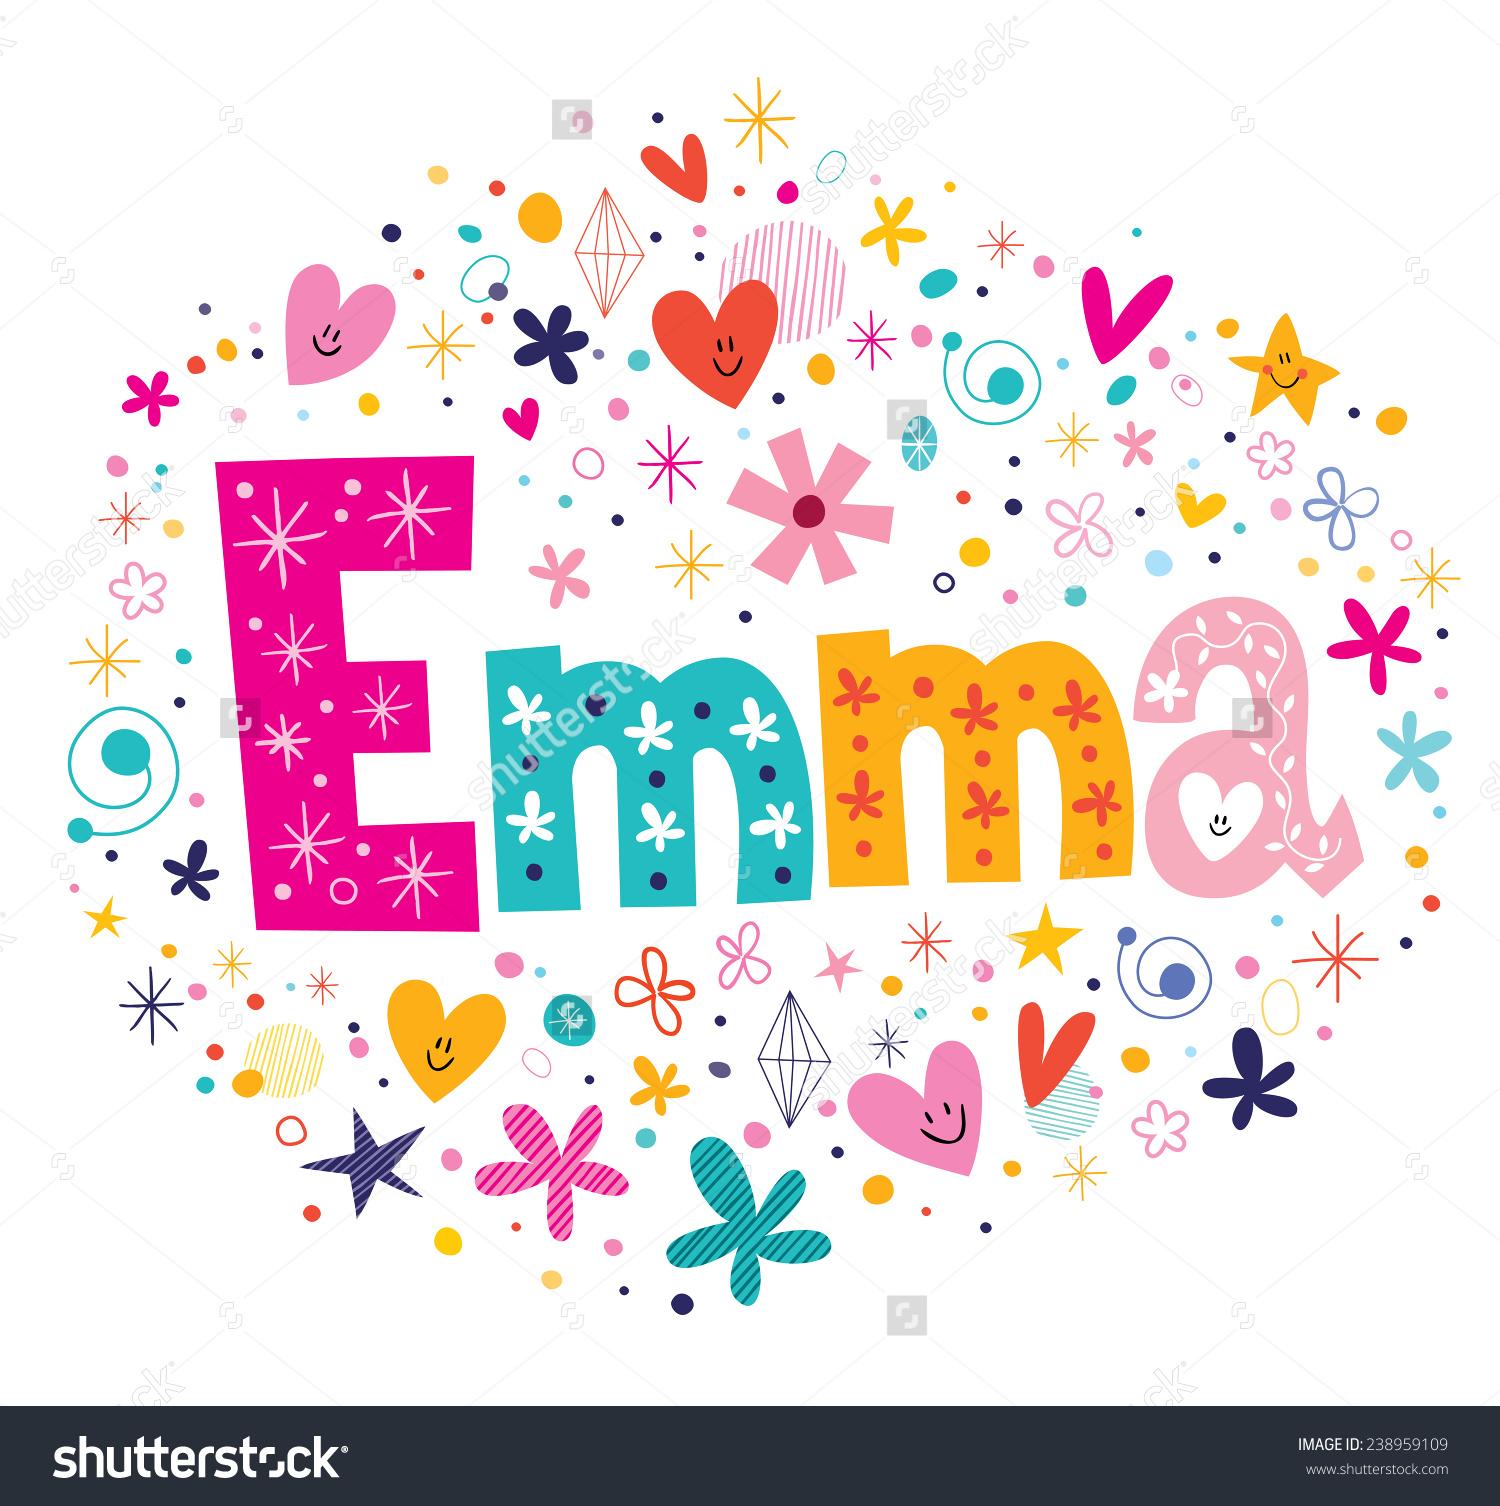 Emma Female Name Decorative Lettering Type Stock Vector 238959109.